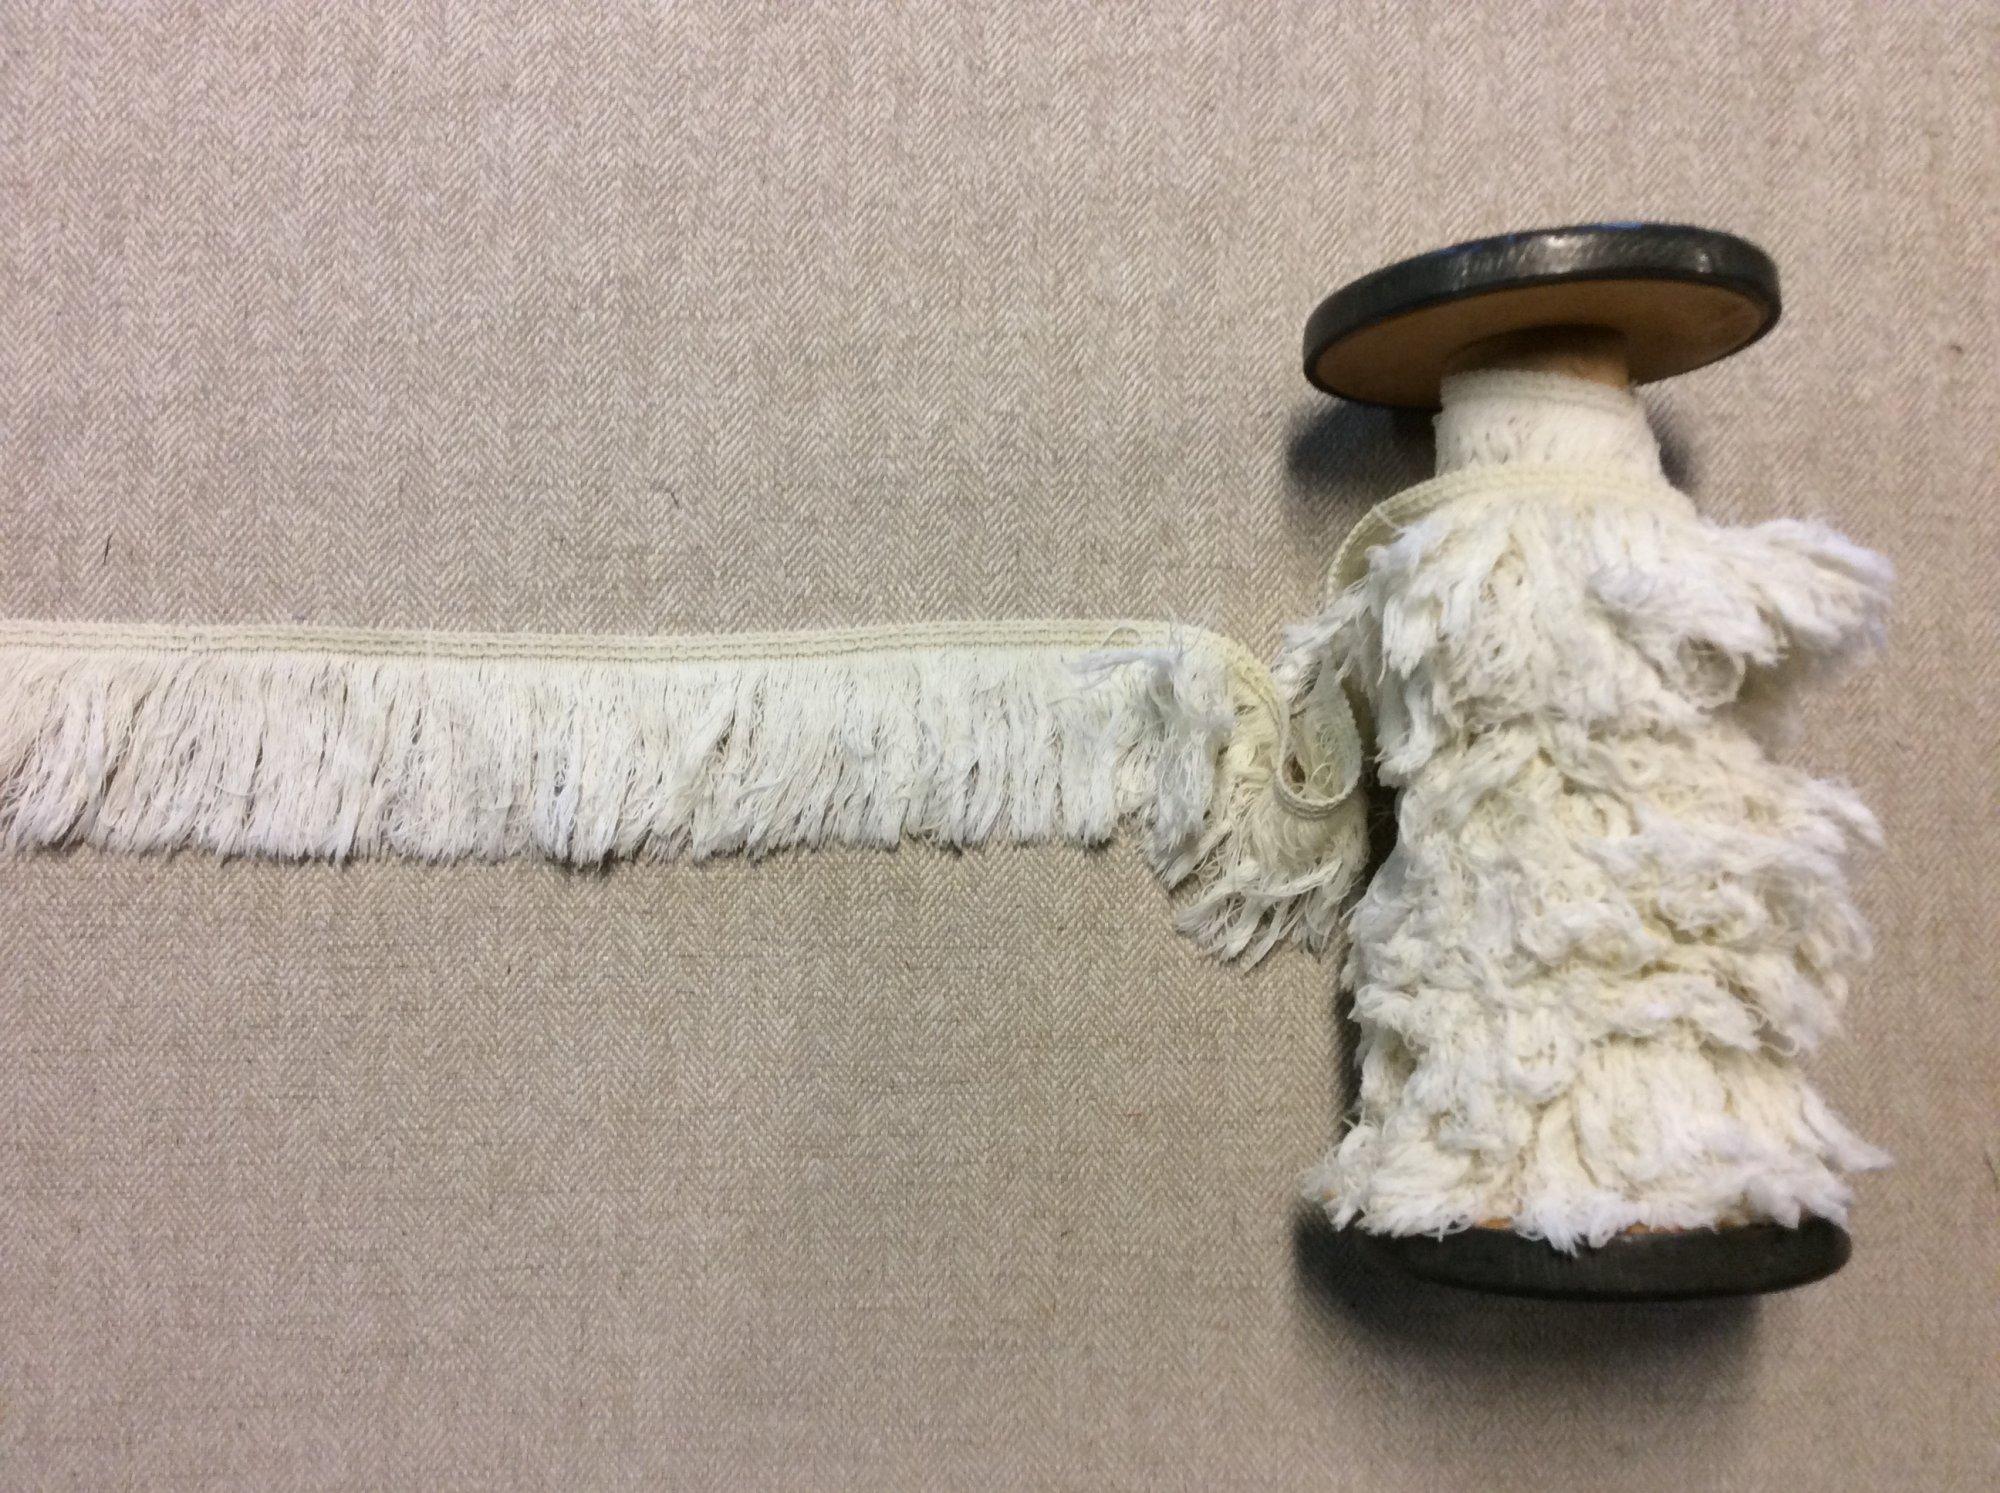 True Vintage White Cotton Fringe Apparel Home Decor Trim TRIM1084